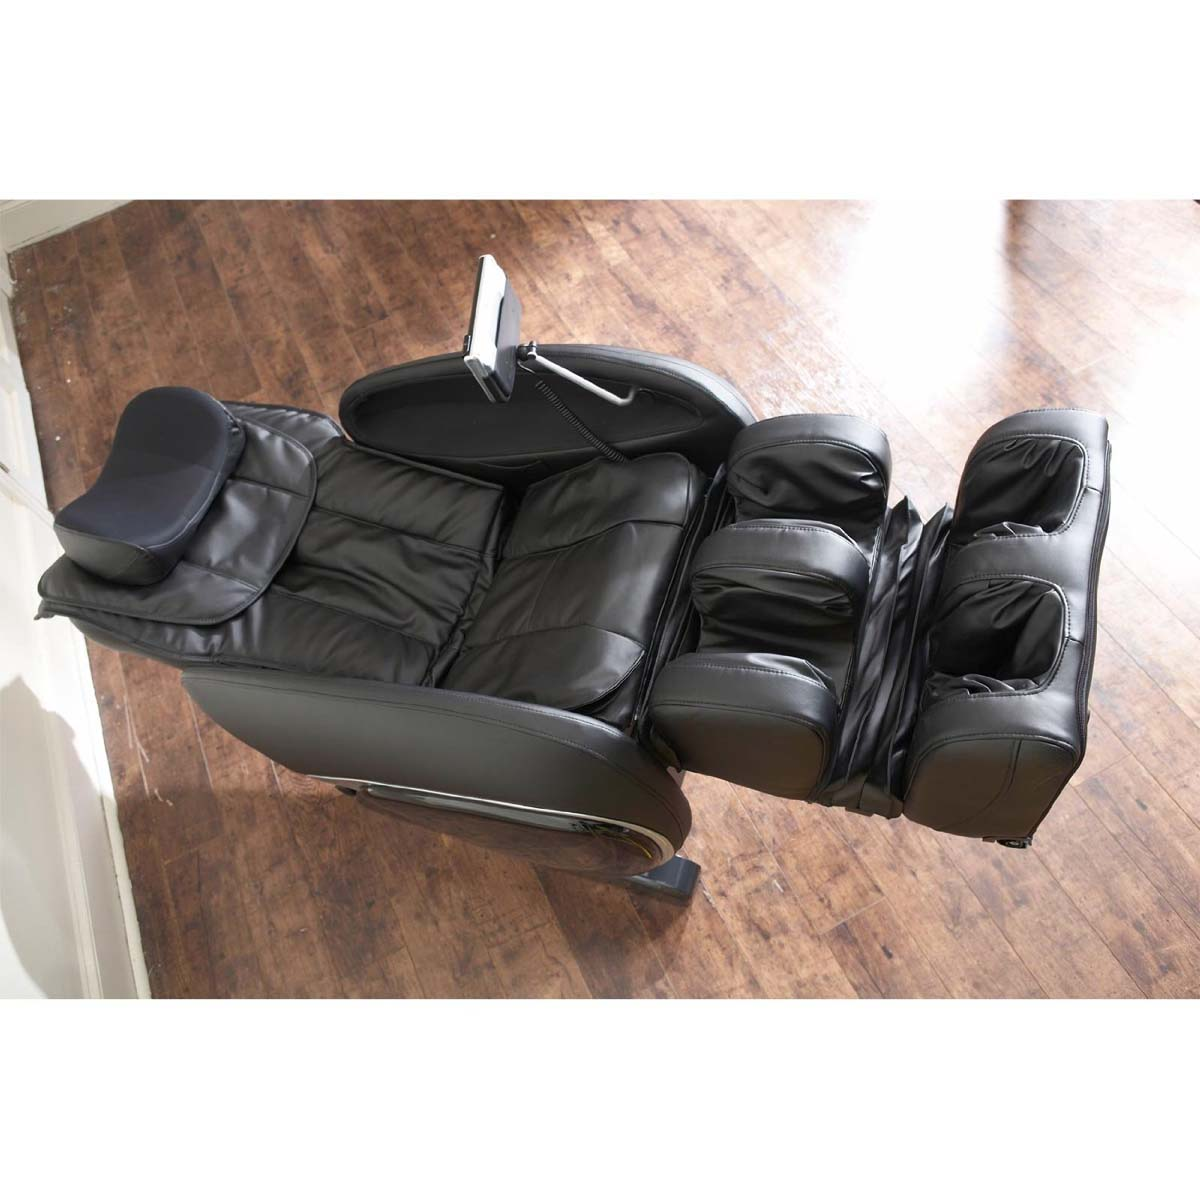 Zero gravity massage chairs - Berkline 16027 Feel Good Shiatsu Zero Gravity Massage Chair